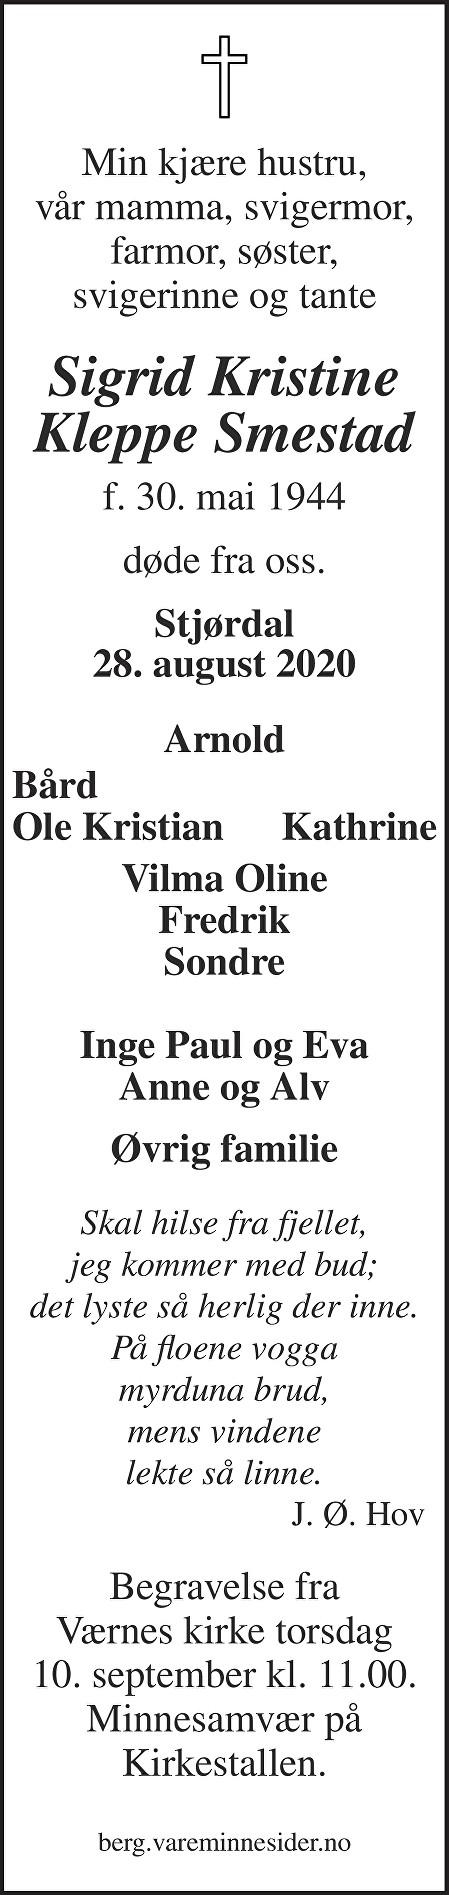 Sigrid Kristine Kleppe Smestad Dødsannonse